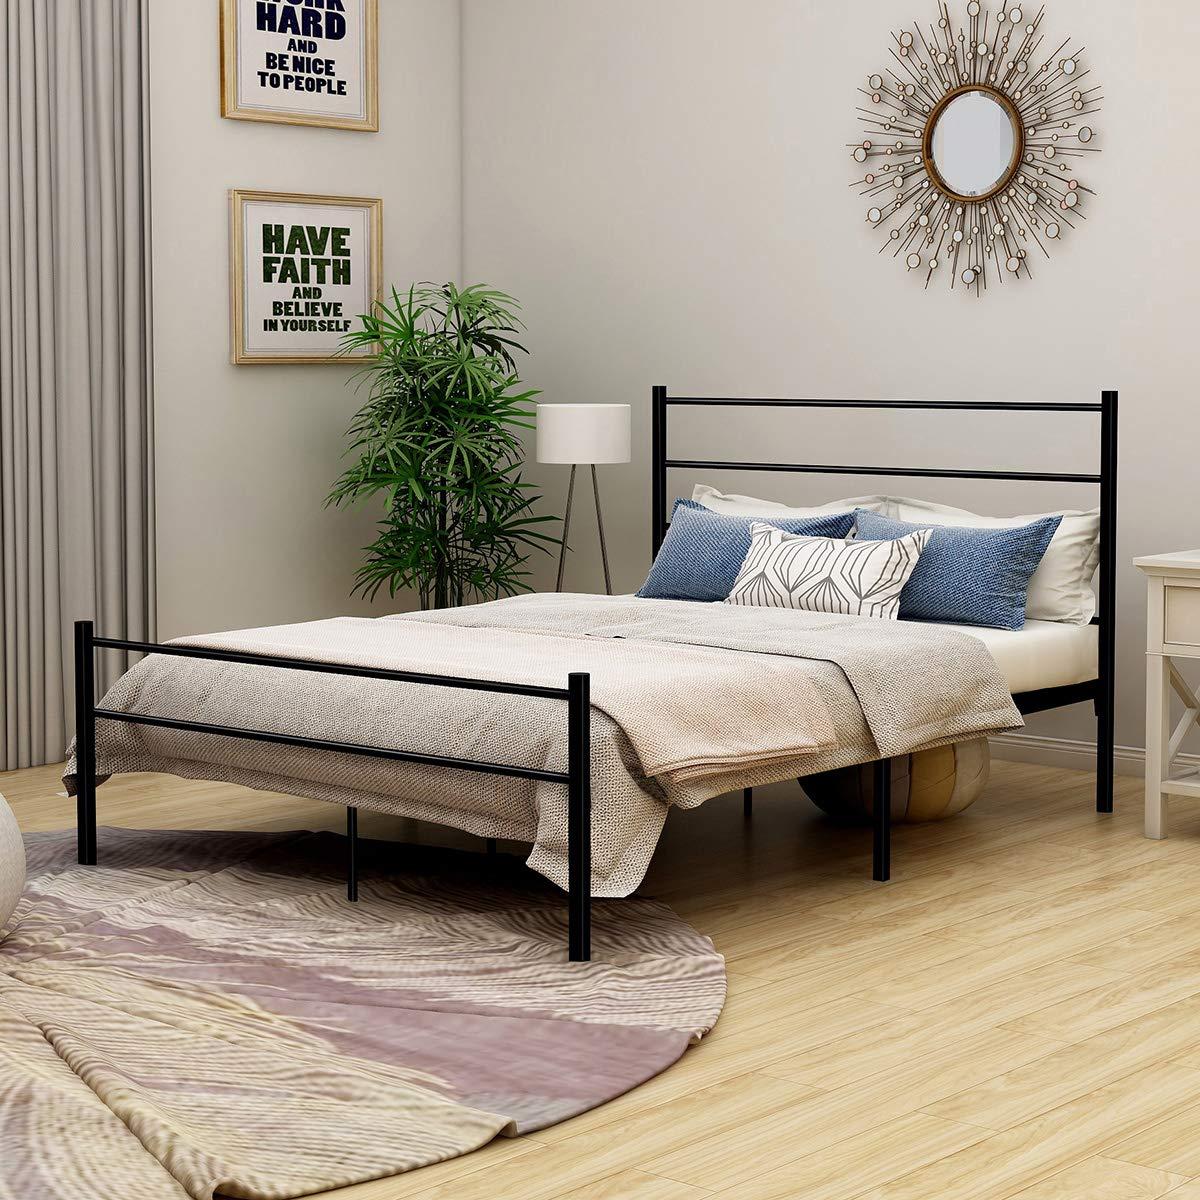 Metal Bed with Headboard Mattress Foundationt Platform Frame Metal Slat Black Full Size by DUMEE